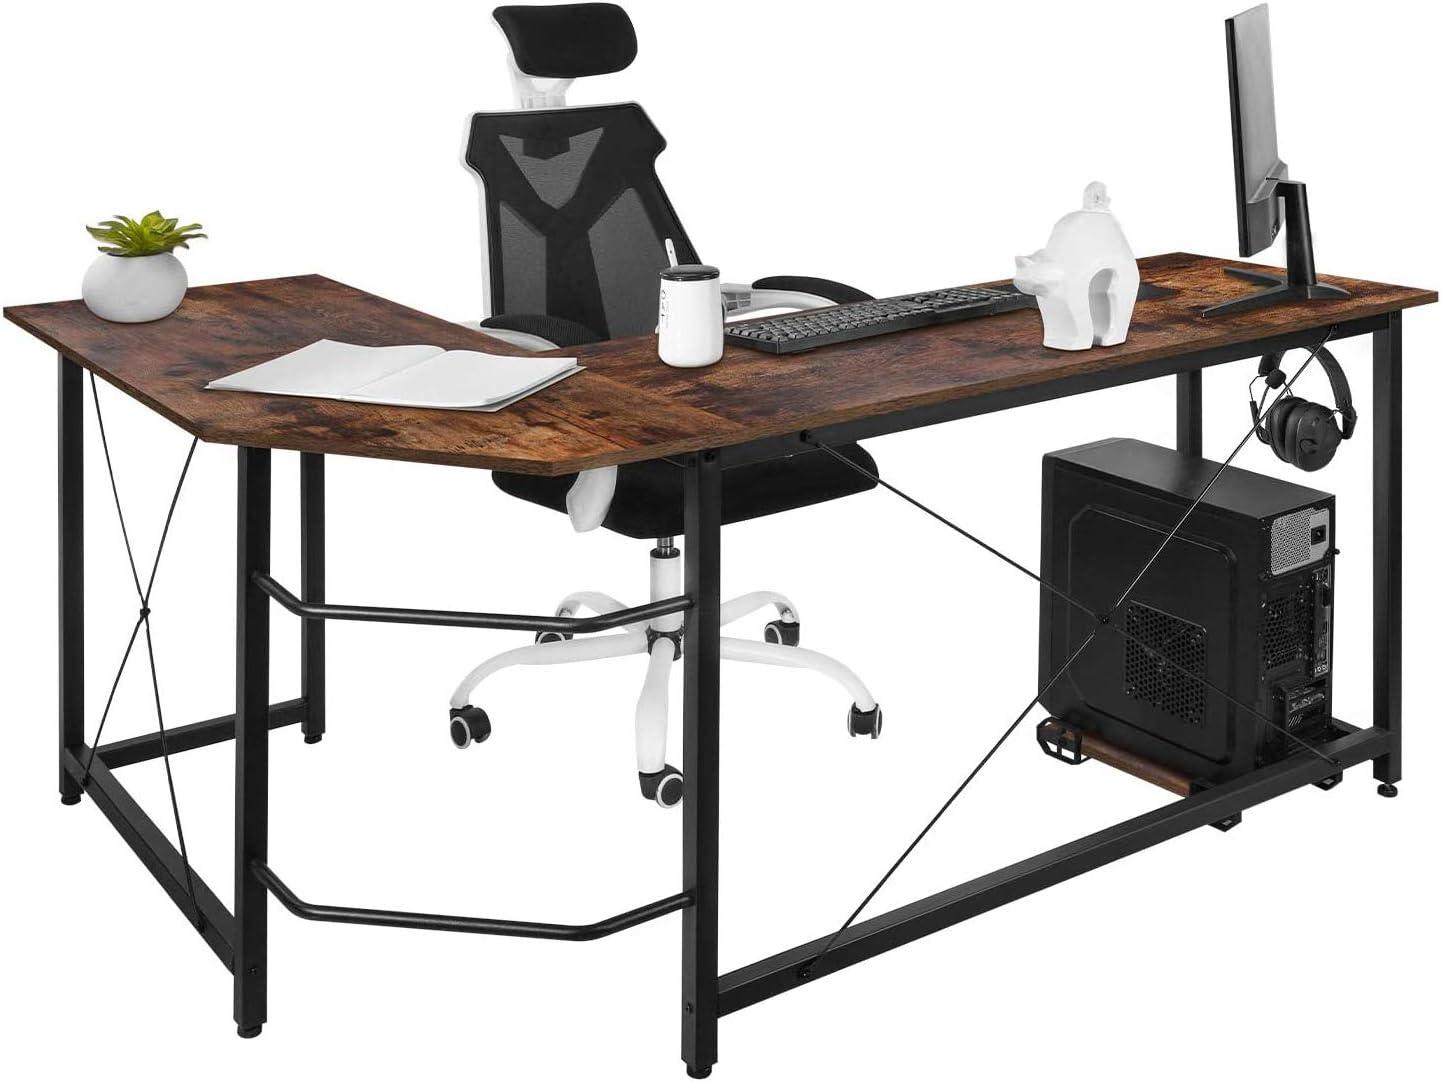 Gaming Computer Corner Desk Pc Studio Table Workstation for Home Office,150cm W H *60cm Dawoo L Shaped Desk L Rustic Brown *75cm